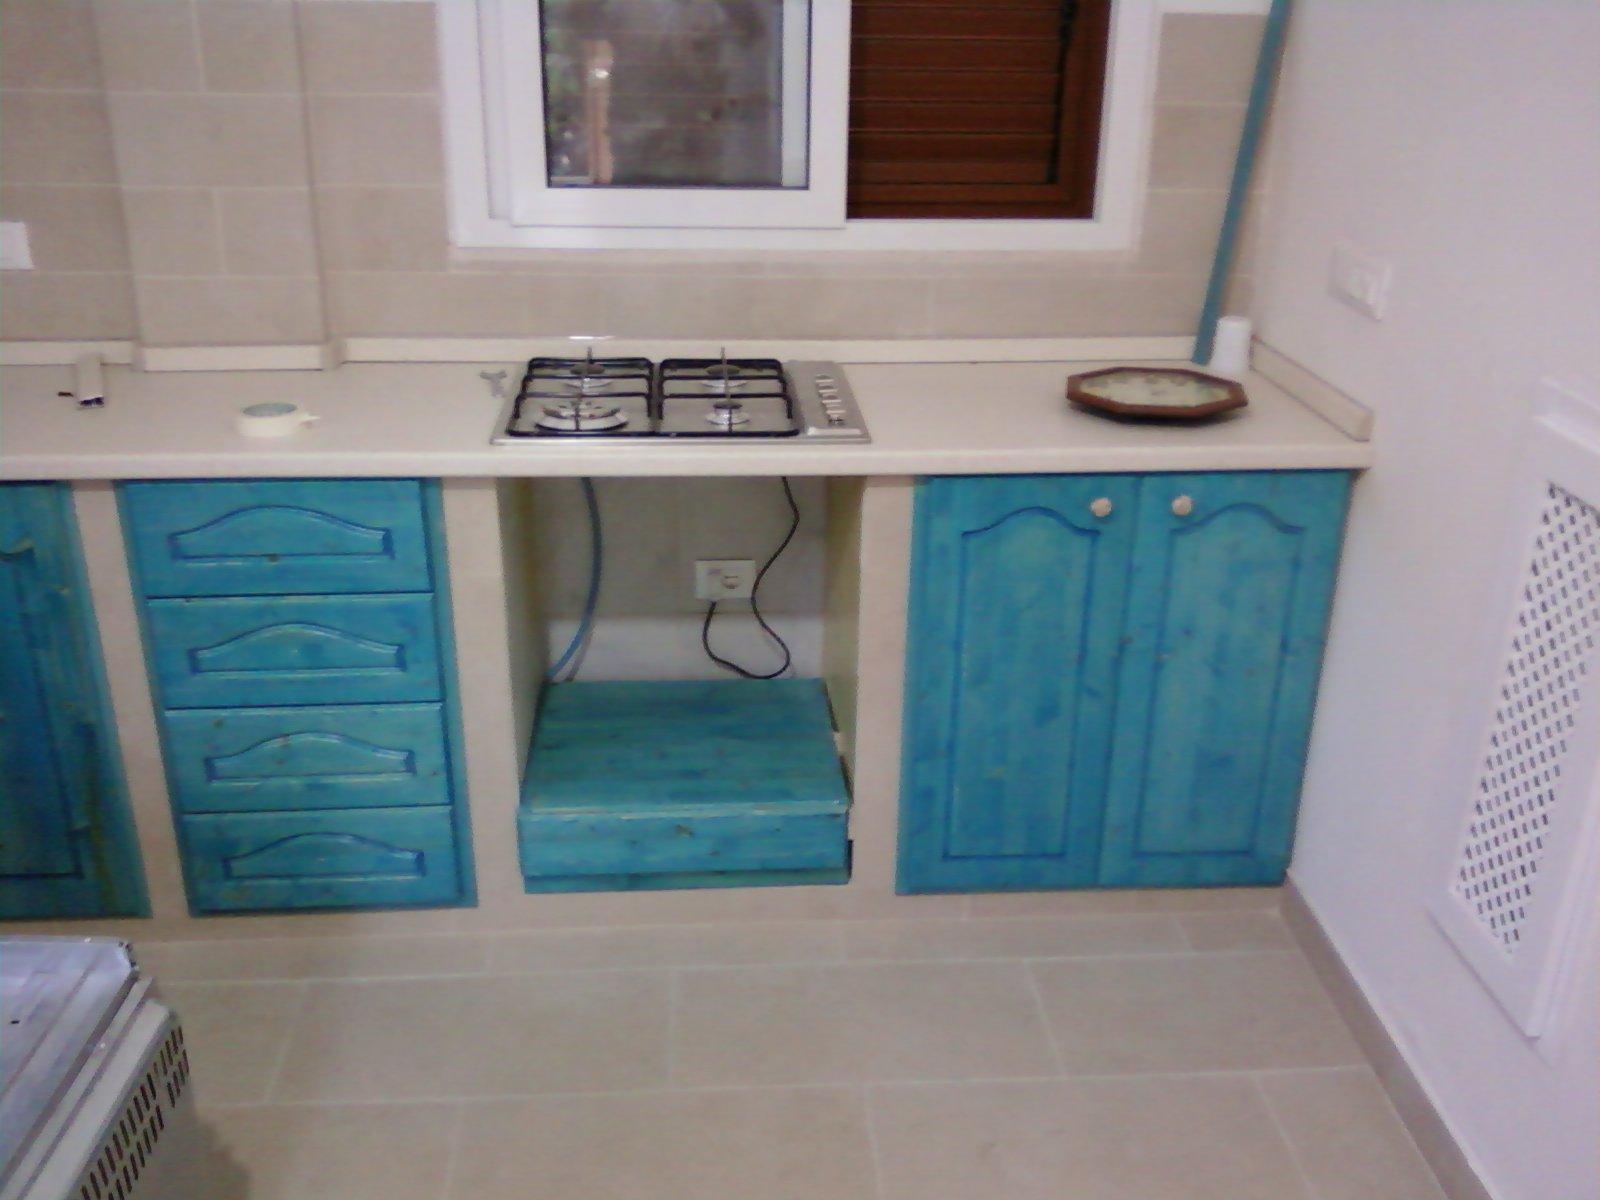 Fai da te hobby legno cucina in muratura for Cucina giocattolo fai da te